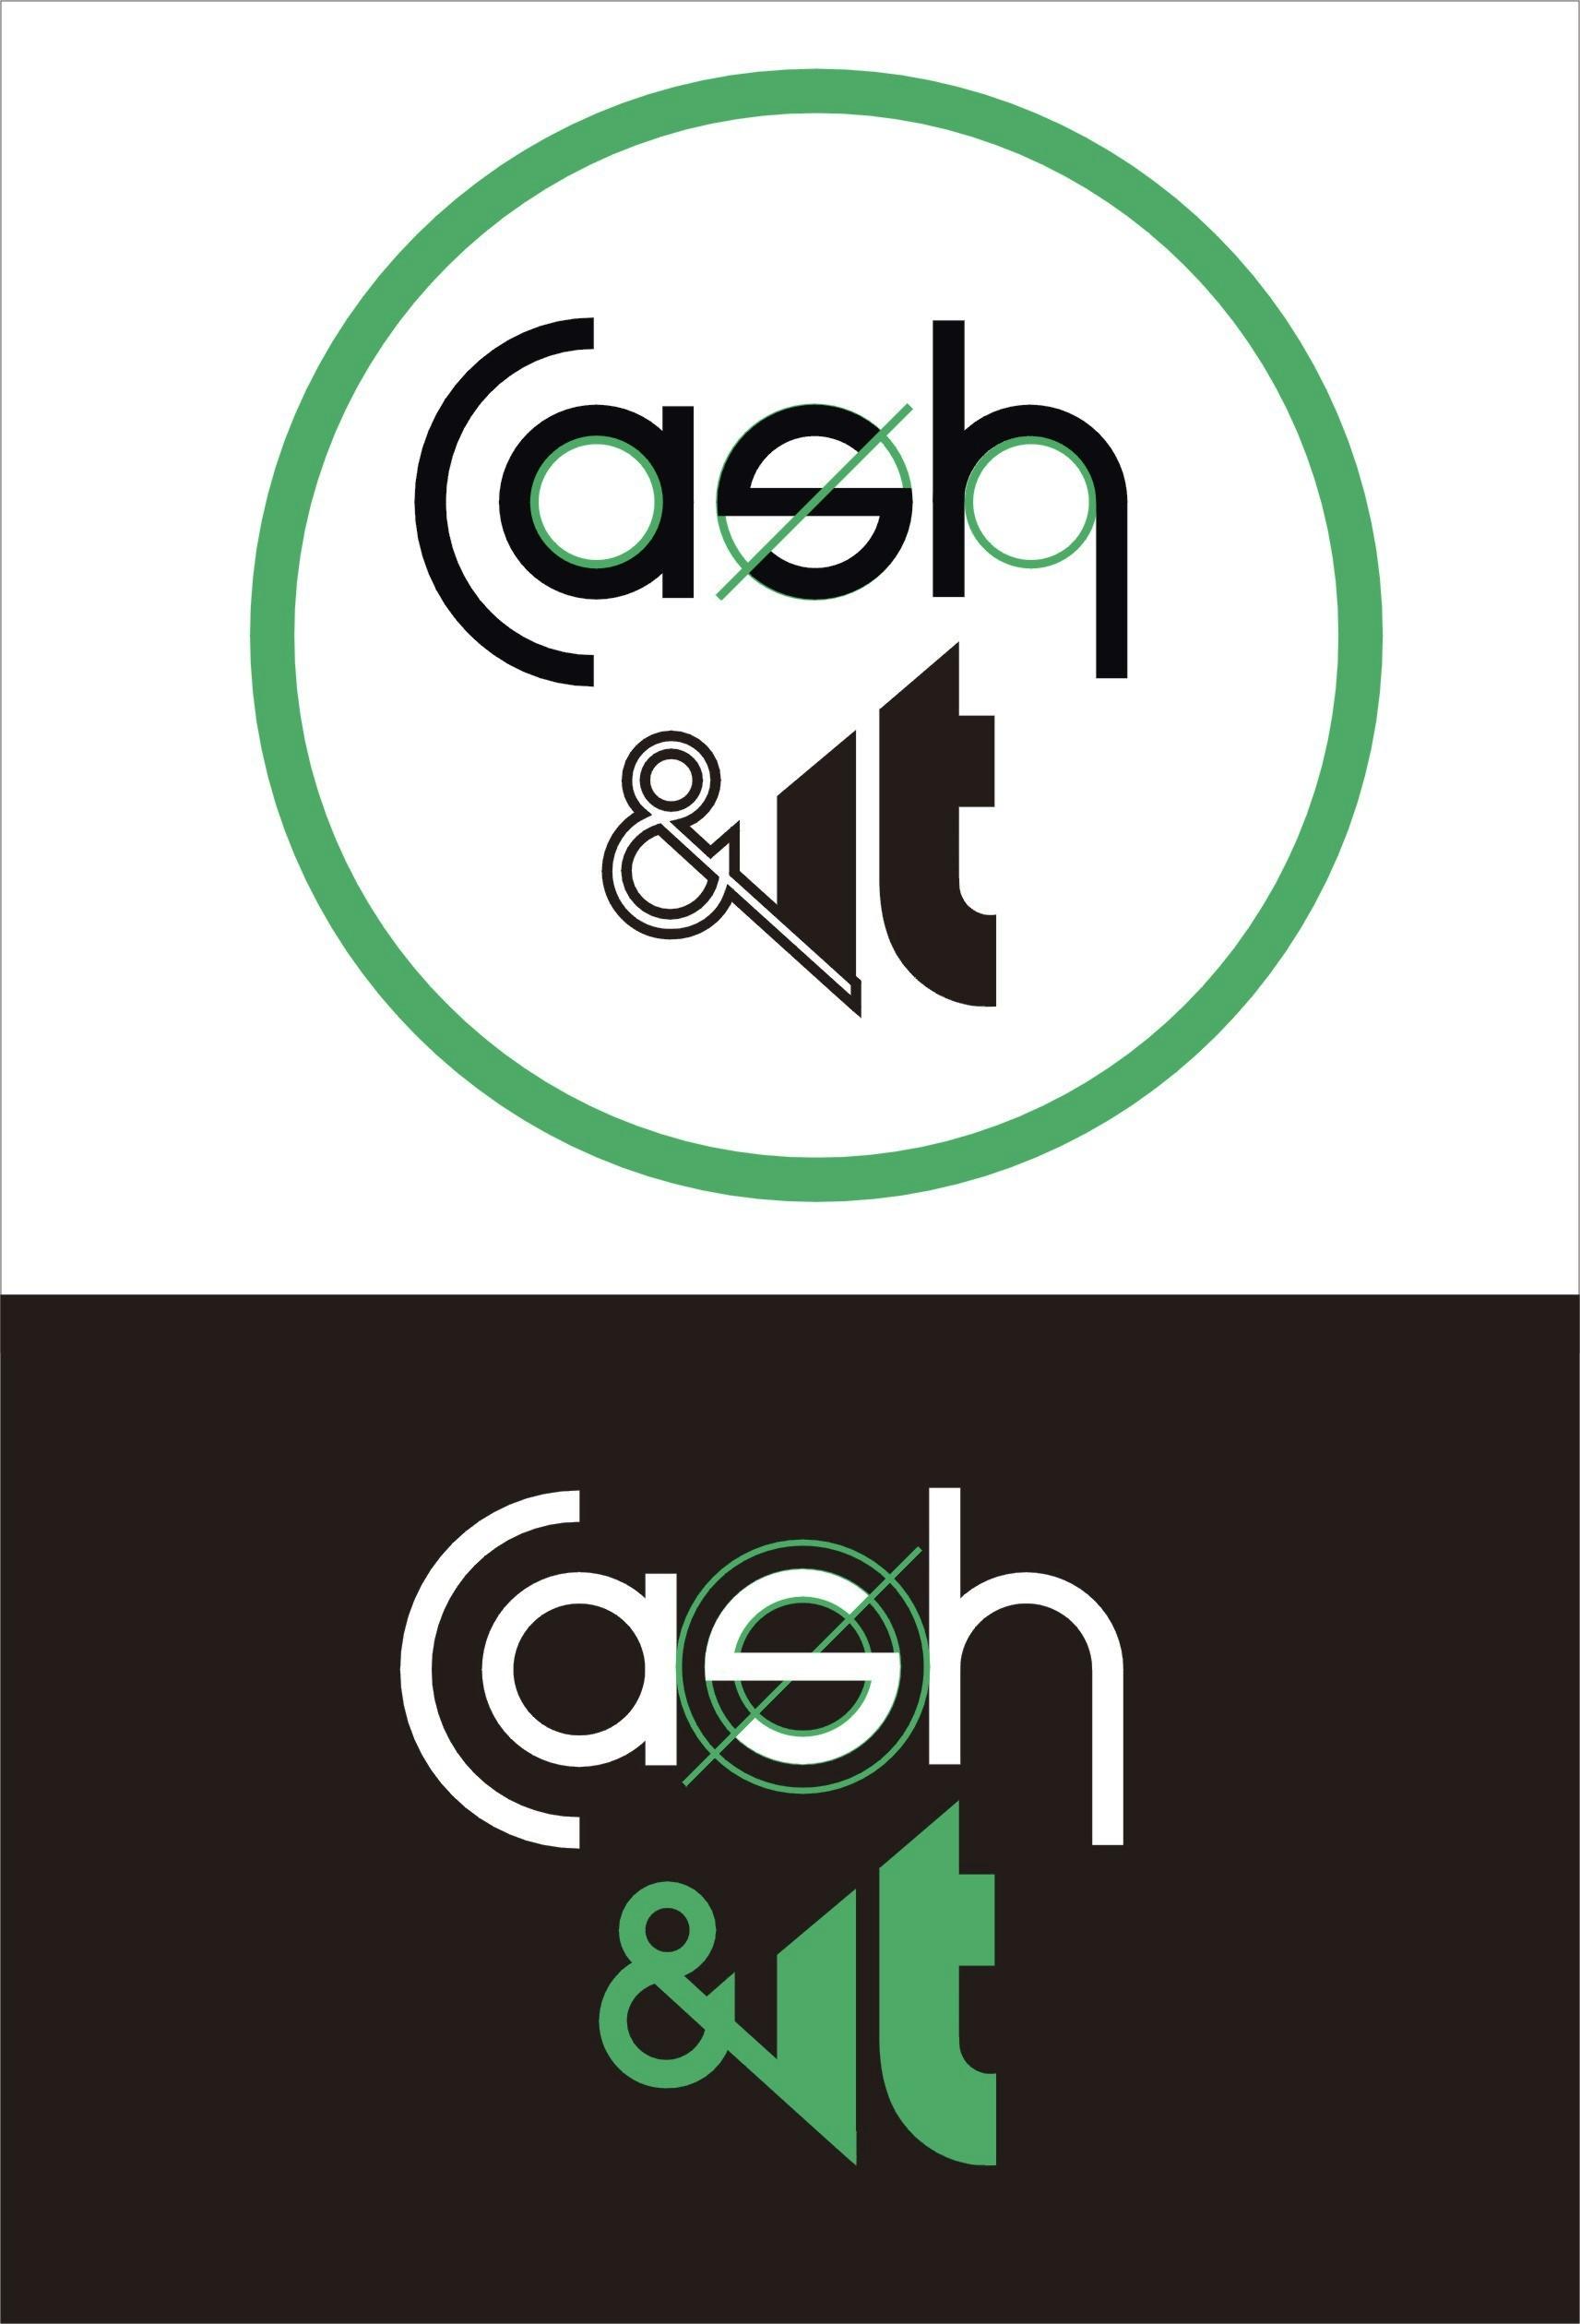 Логотип для Cash & IT - сервис доставки денег фото f_1015feb5f356ec71.jpg